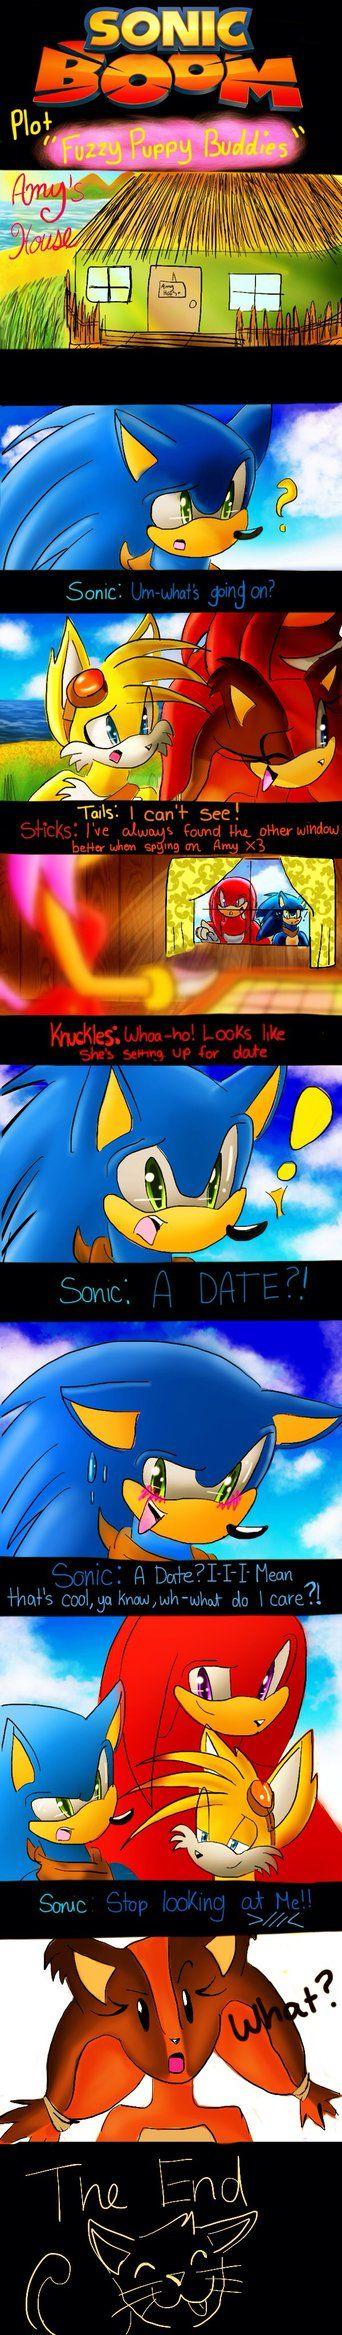 Sonic Boom Comic by sonamycomic on DeviantArt